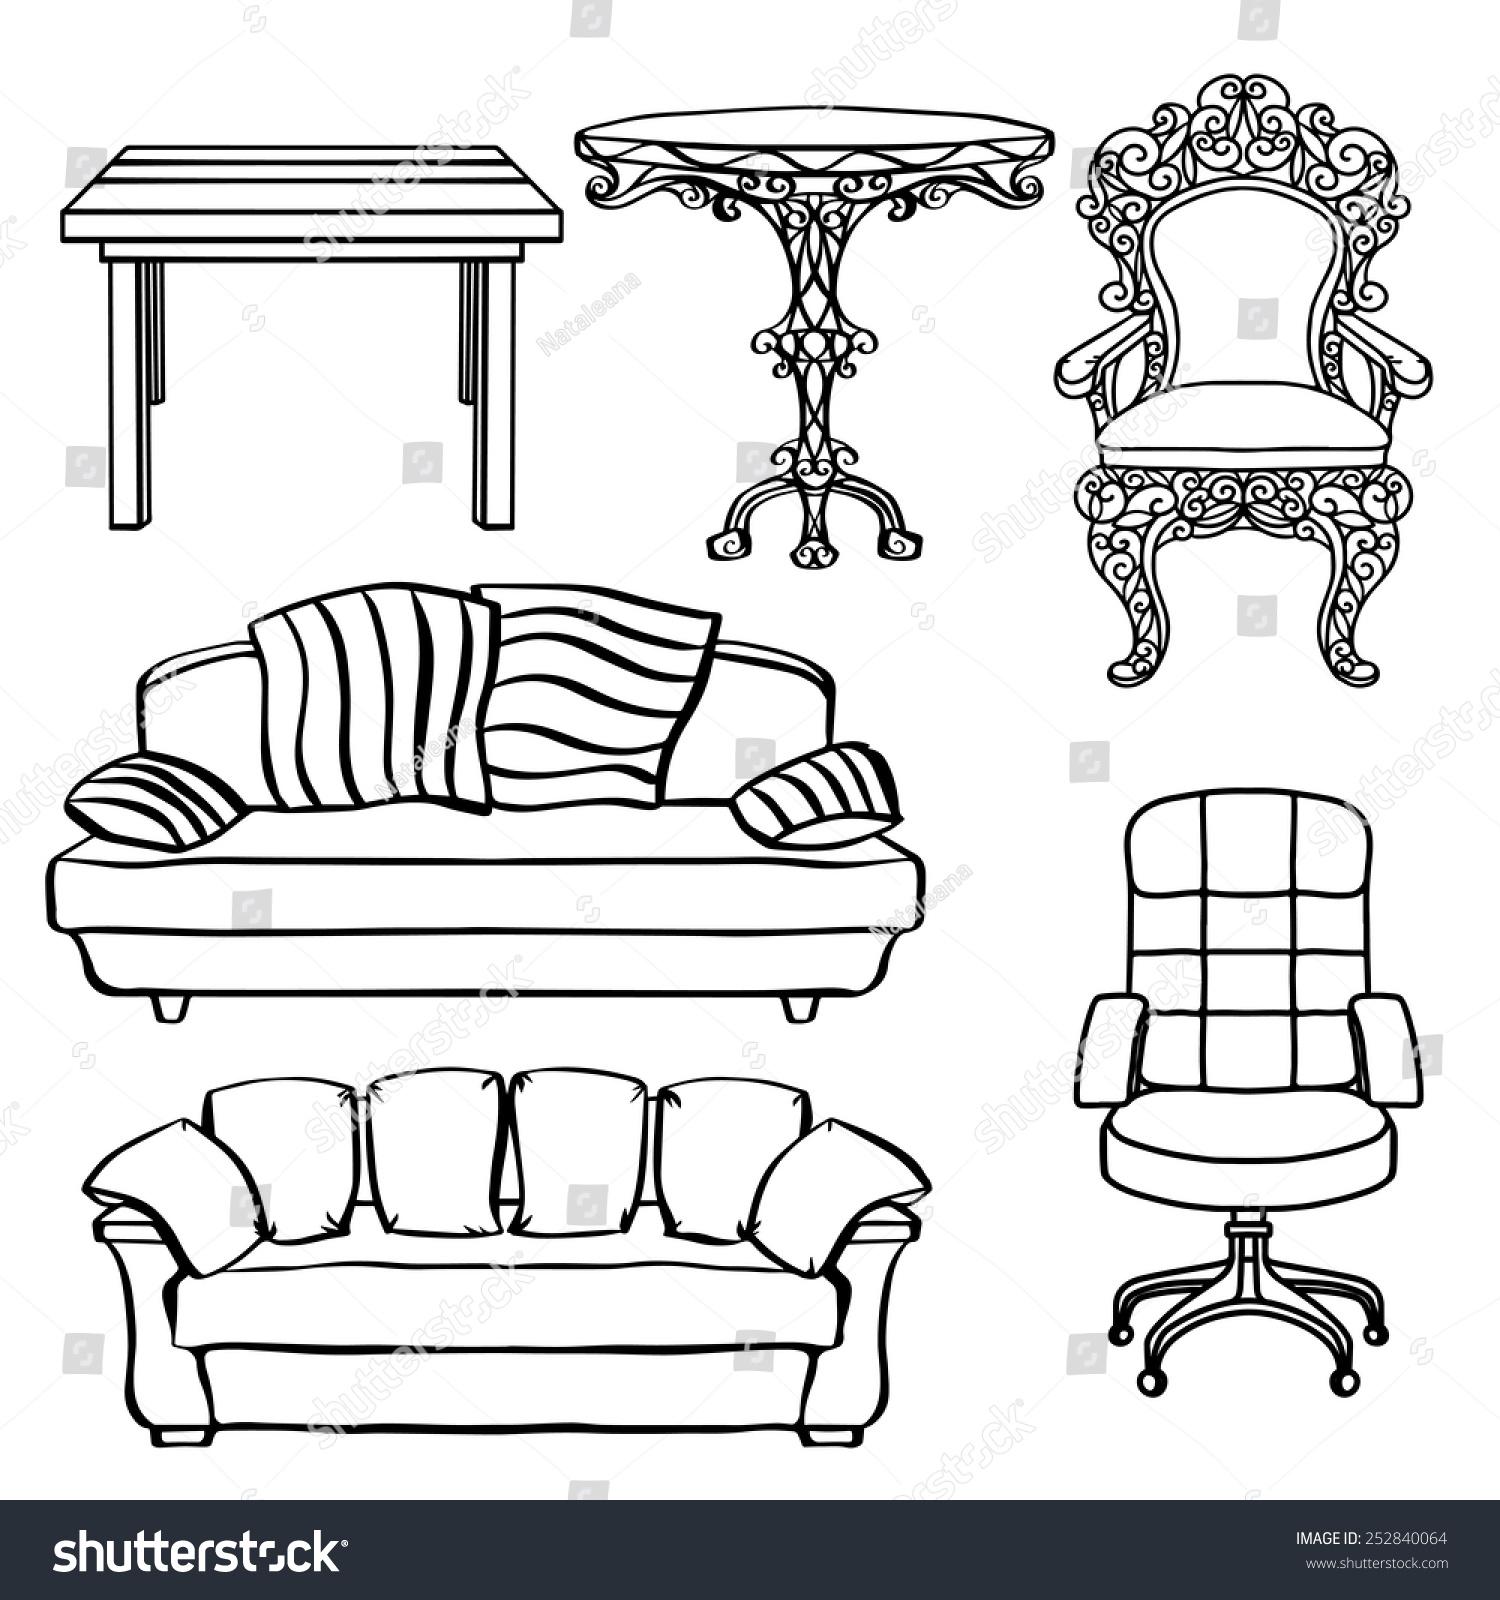 Furniture Set Armchair Sofa Table Chair Stock Vector